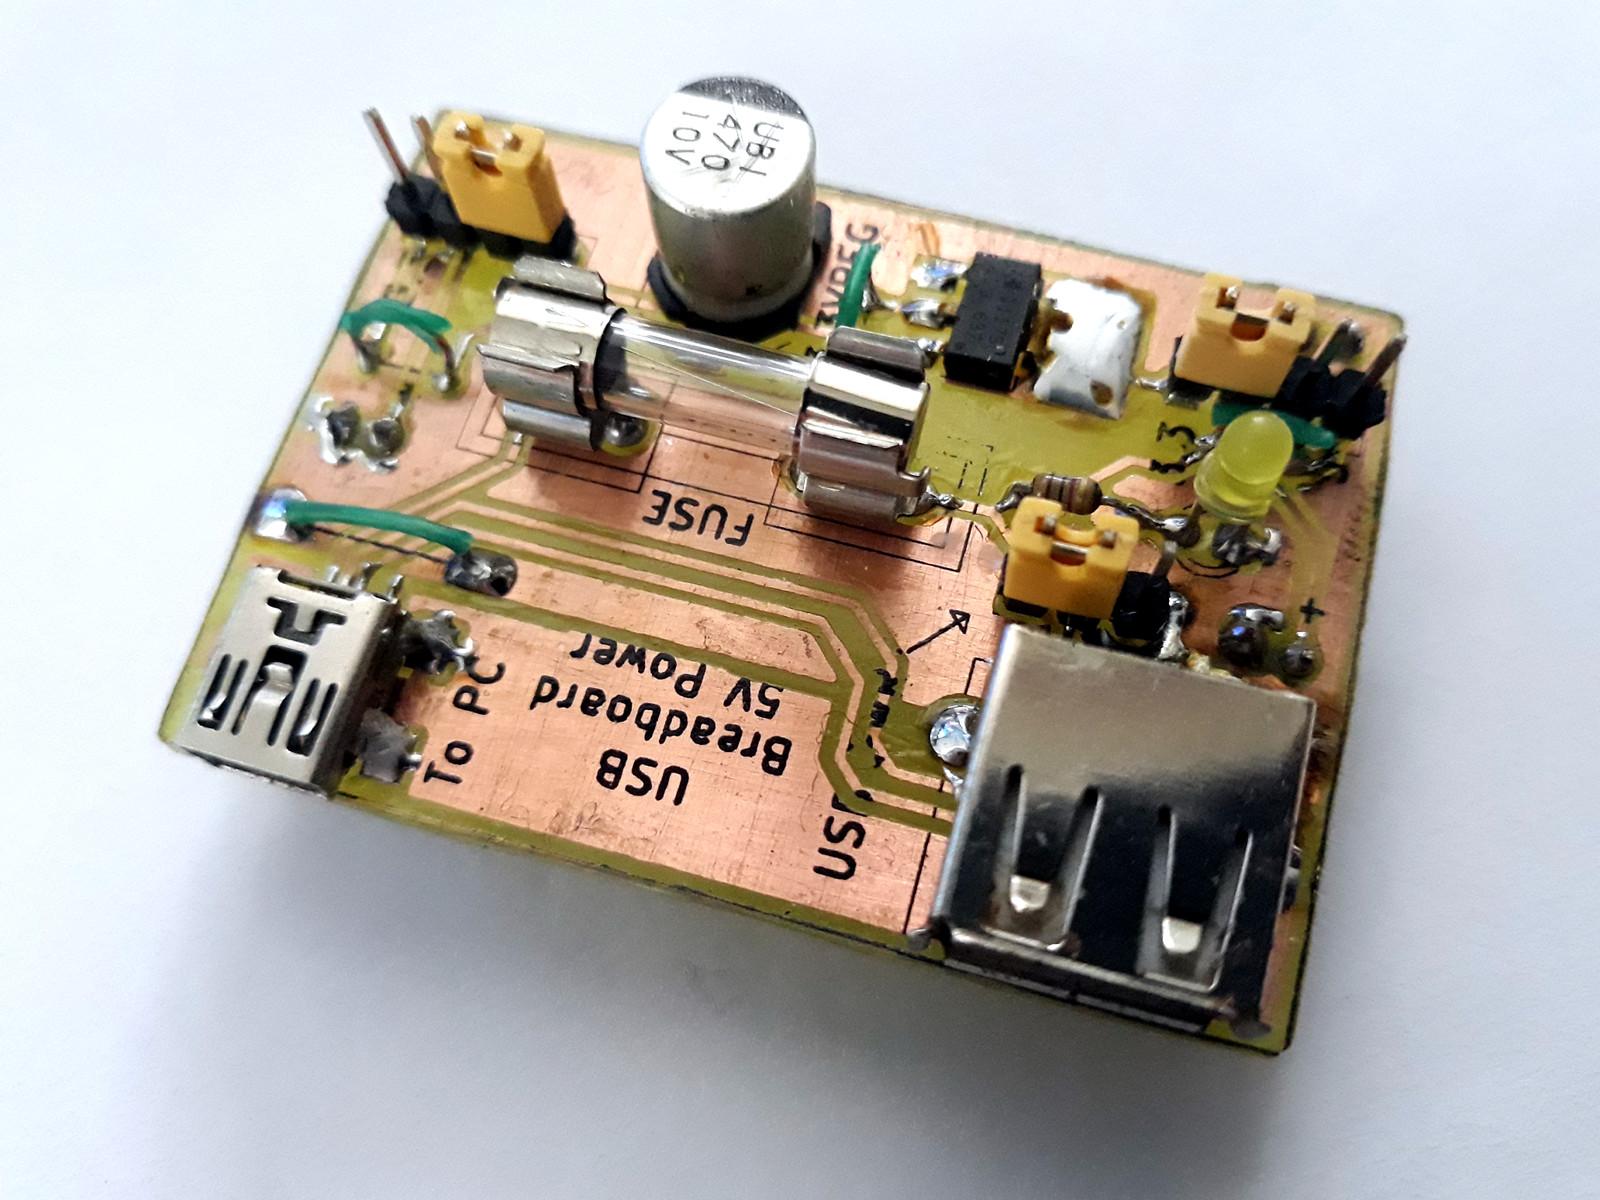 hight resolution of usb power supply for breadboard